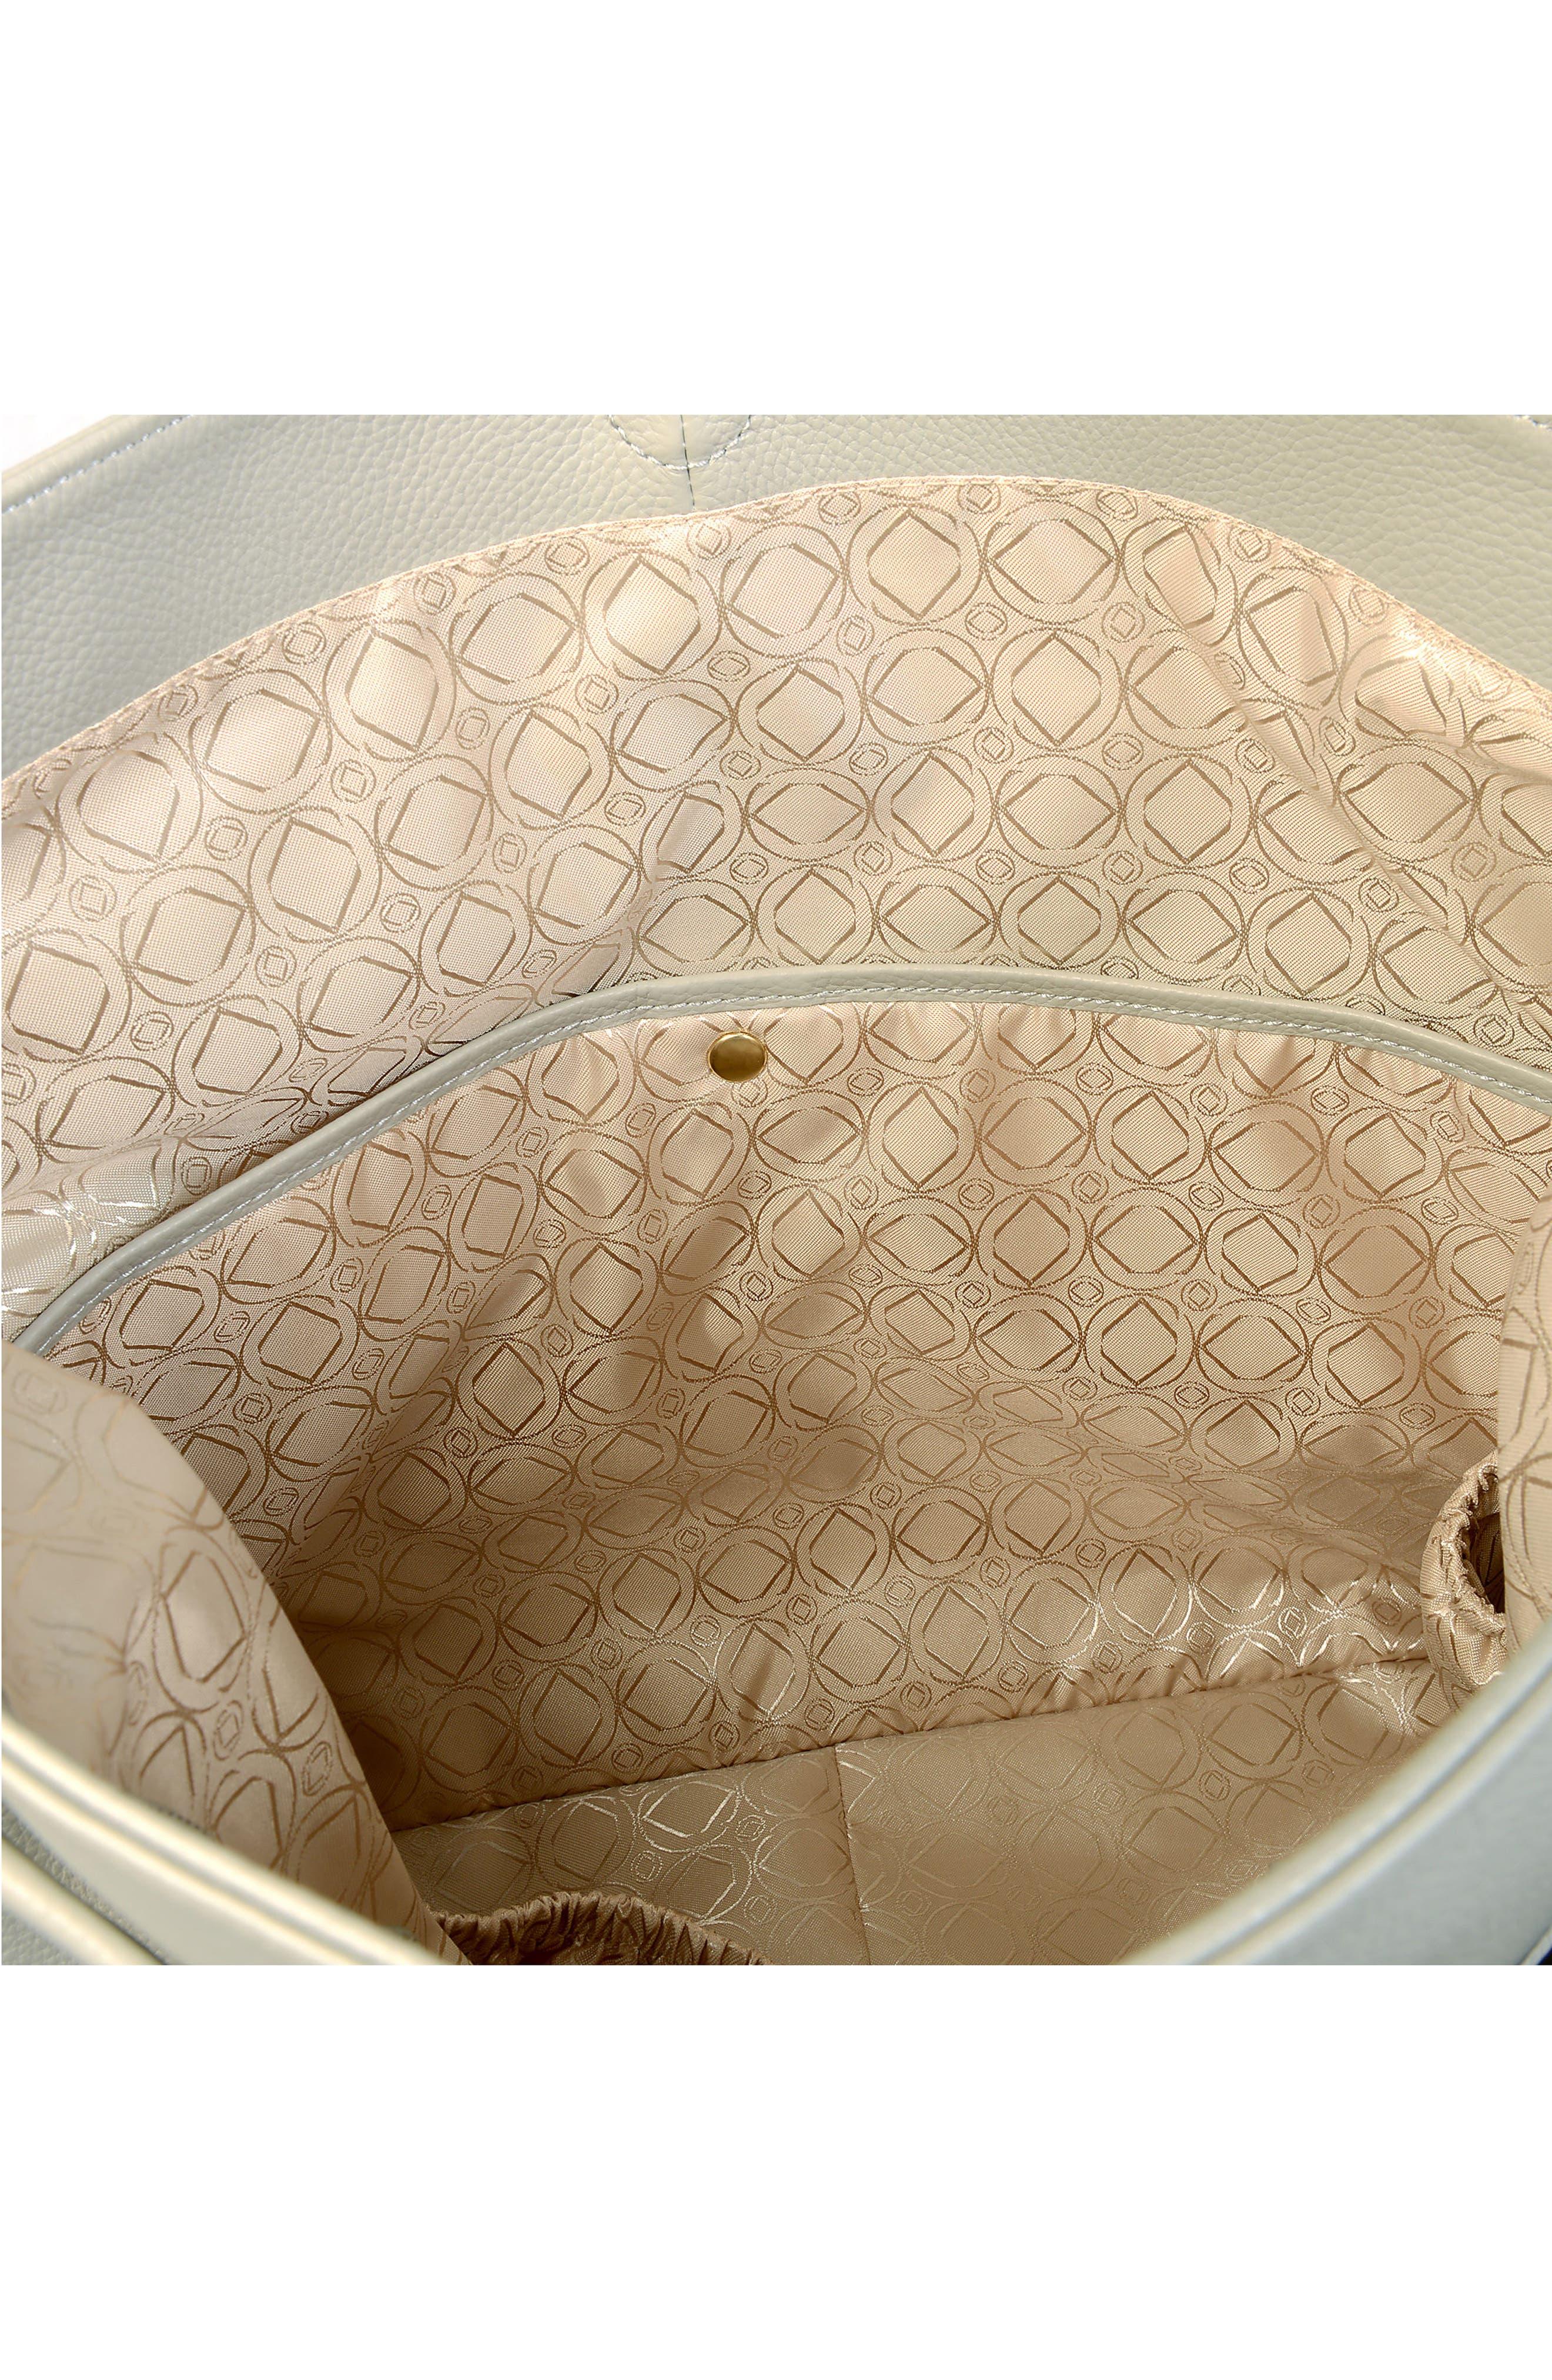 Lennox Leather Diaper Bag,                             Alternate thumbnail 5, color,                             ICE GREY